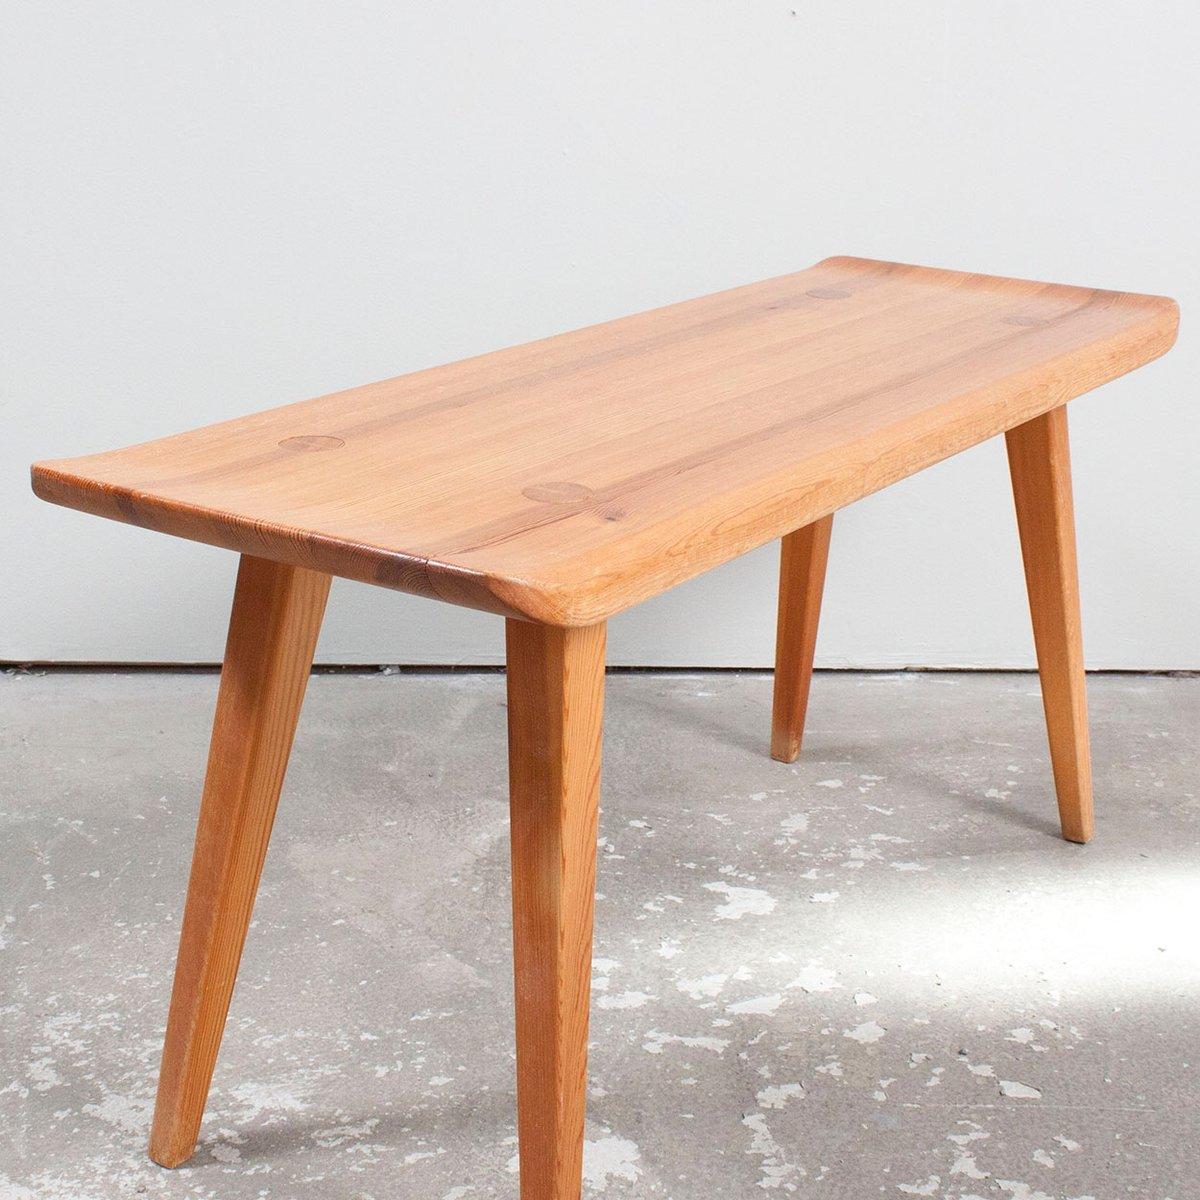 Mid Century Visingsö Pine Bench By Carl Malmsten For Waggeryds Möbelfabrik